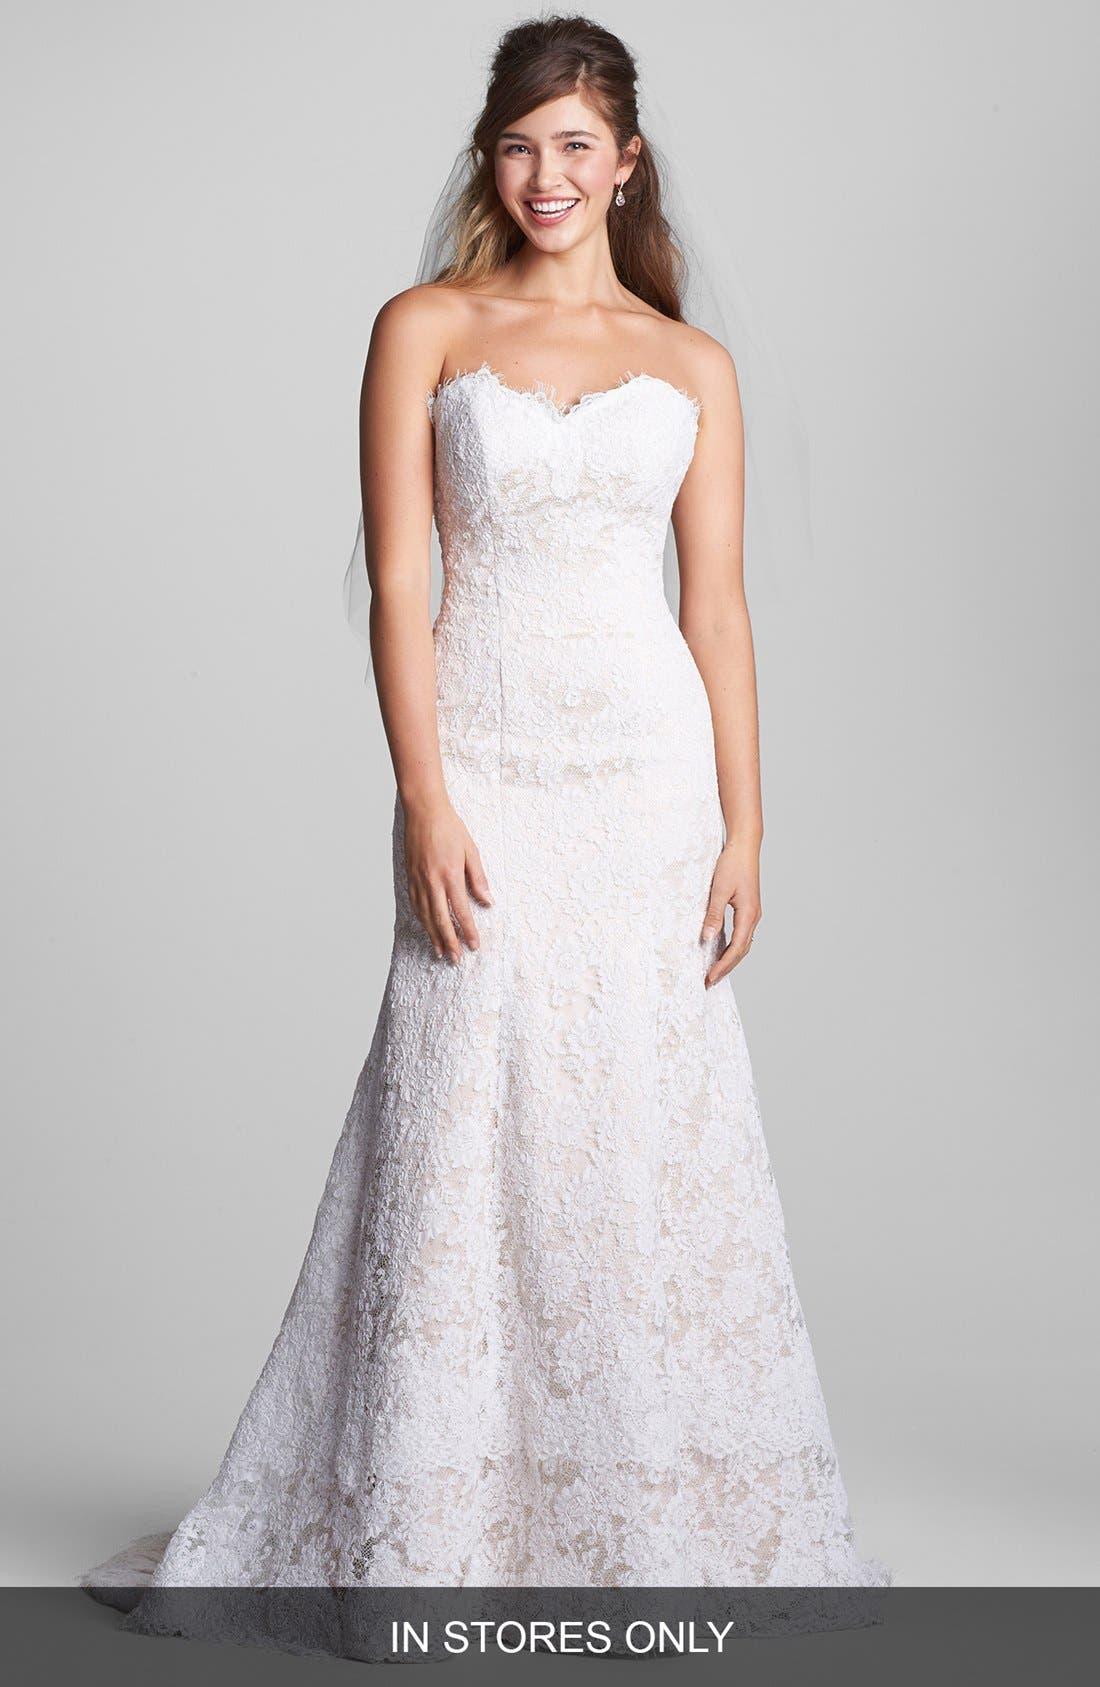 Treasure Flared Lace Dress,                         Main,                         color, Ivory/ Blush